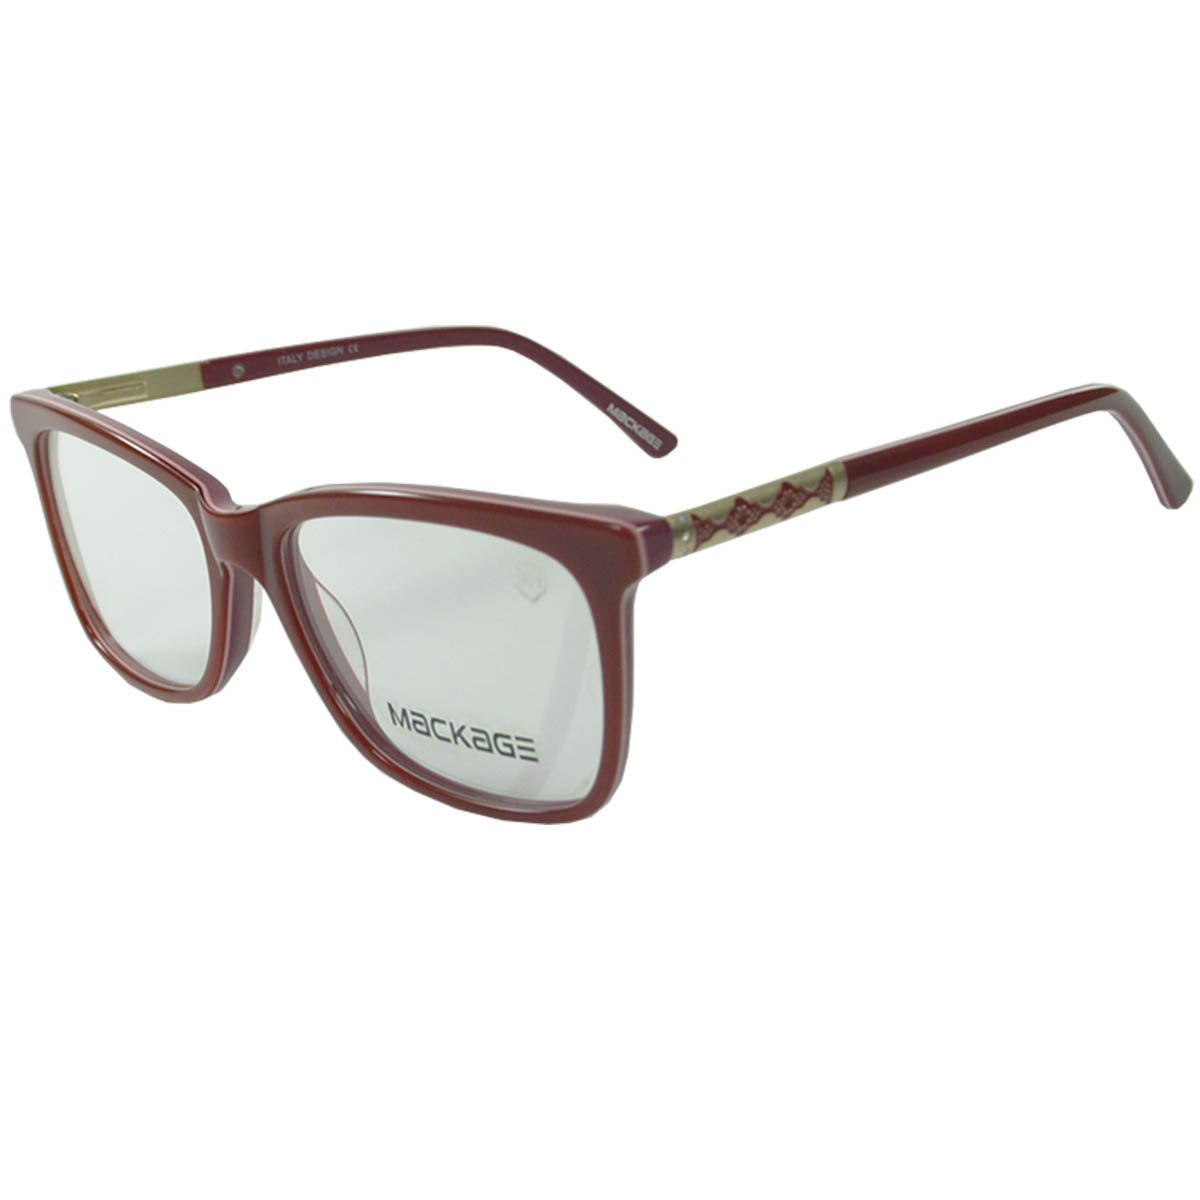 9d8f227a2 Óculos de sol MACKAGE BRASIL